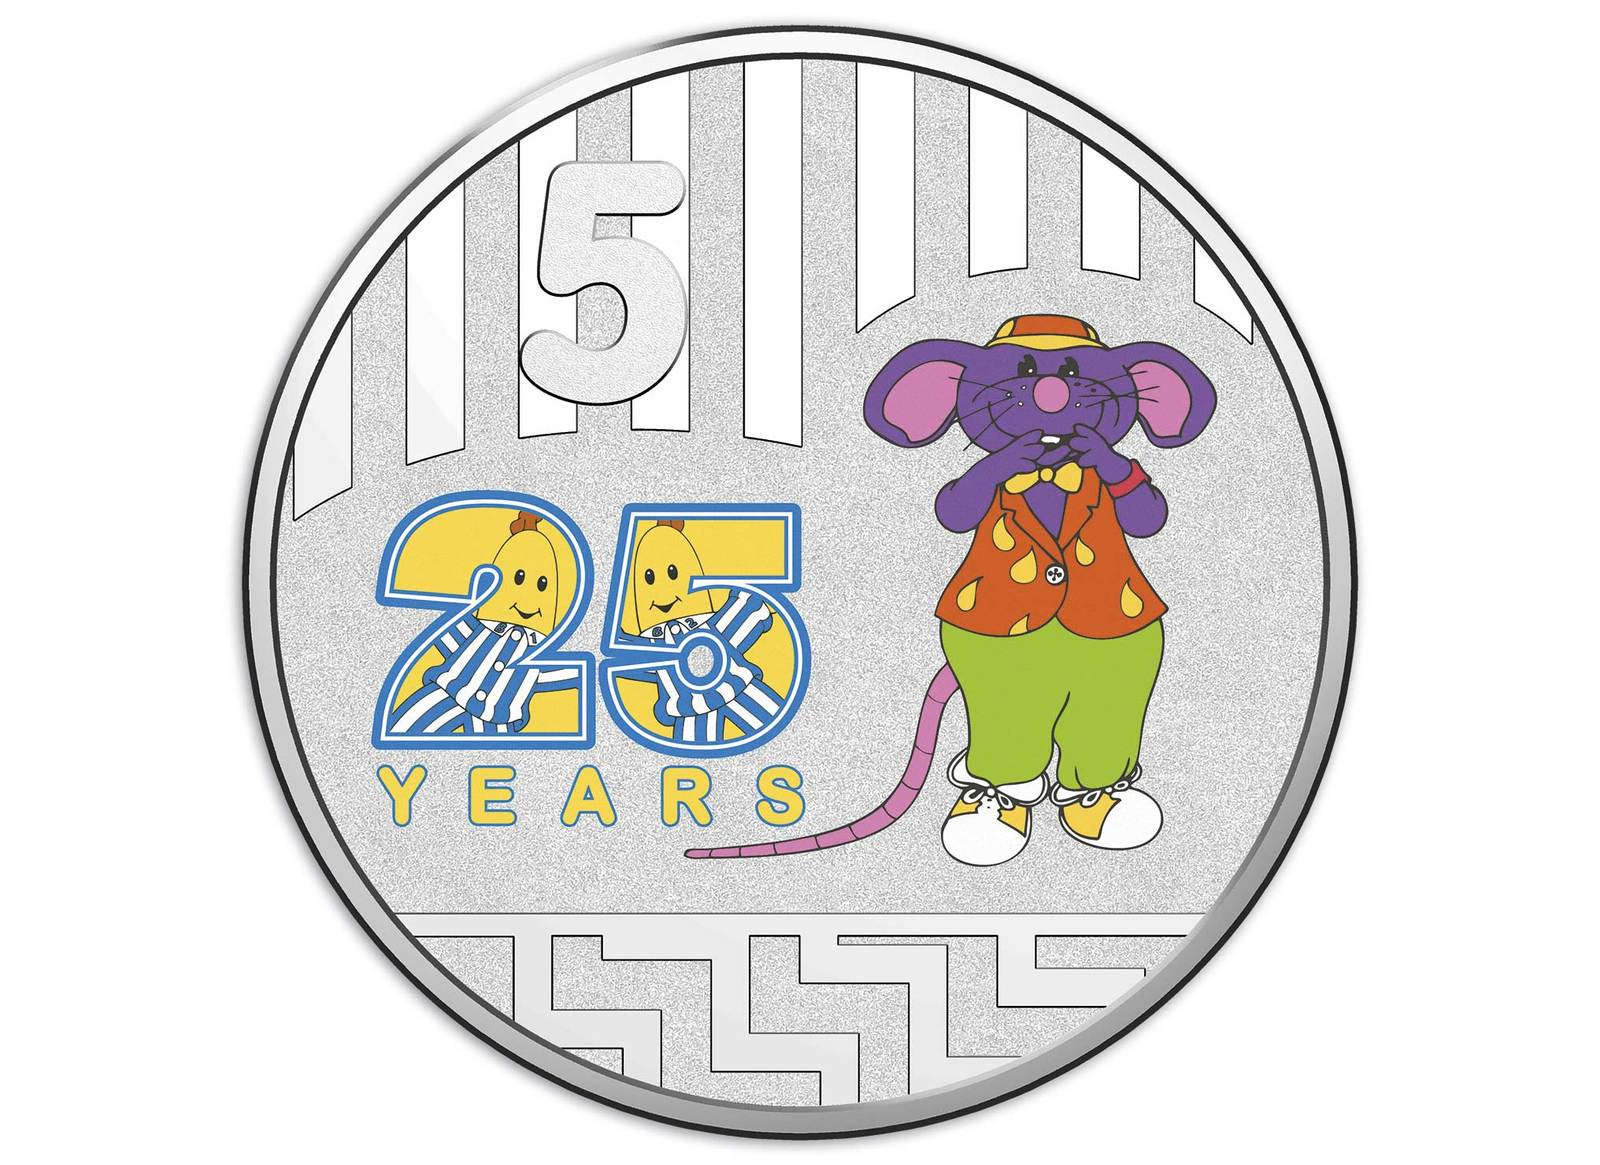 5c UNC Coins 2017 Australia PNC 20c Bananas in Pyjamas 25 years